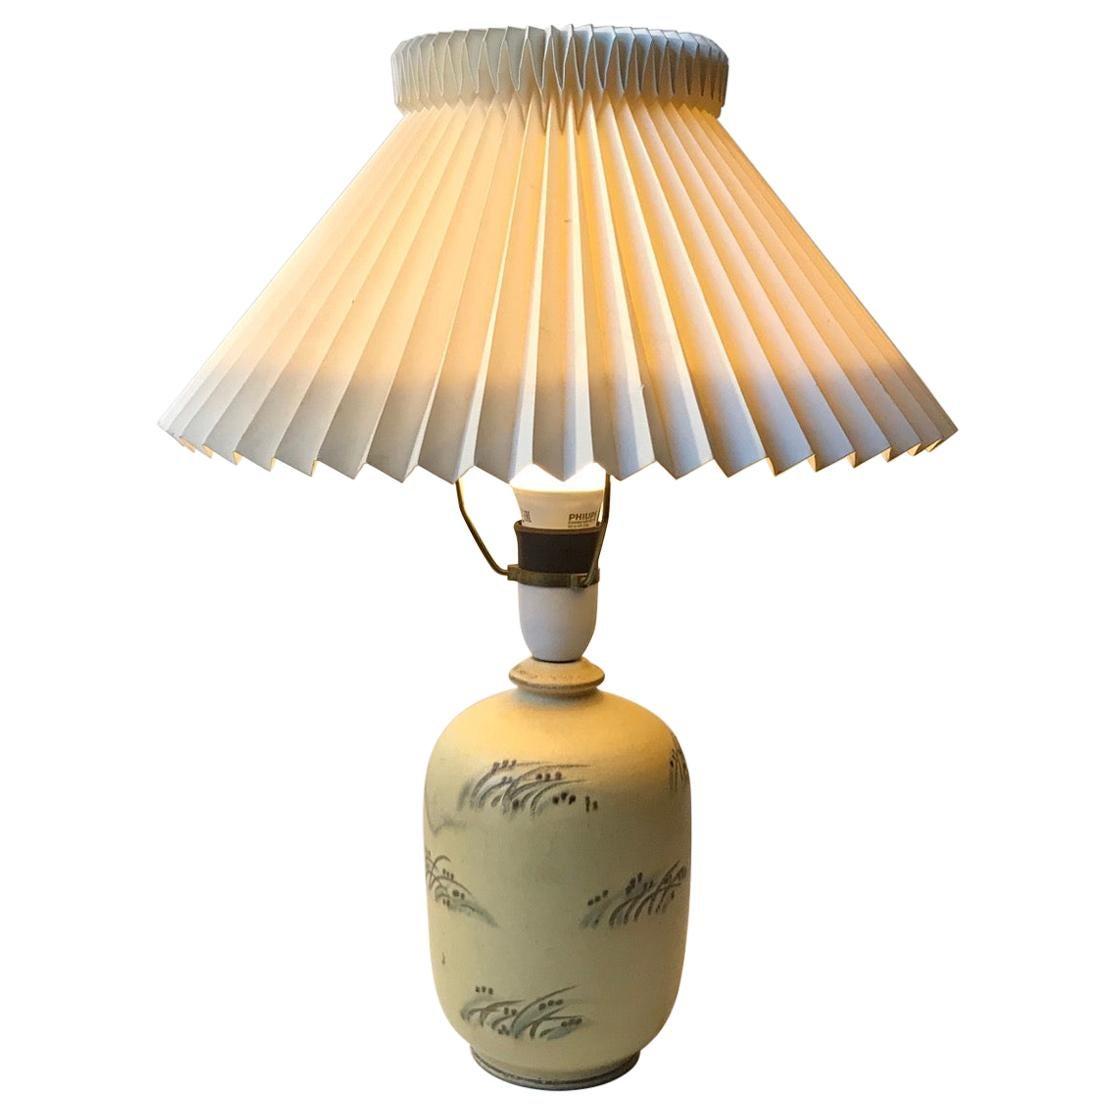 Danish Art Deco Ceramic Table Lamp from Knabstrup, 1930s